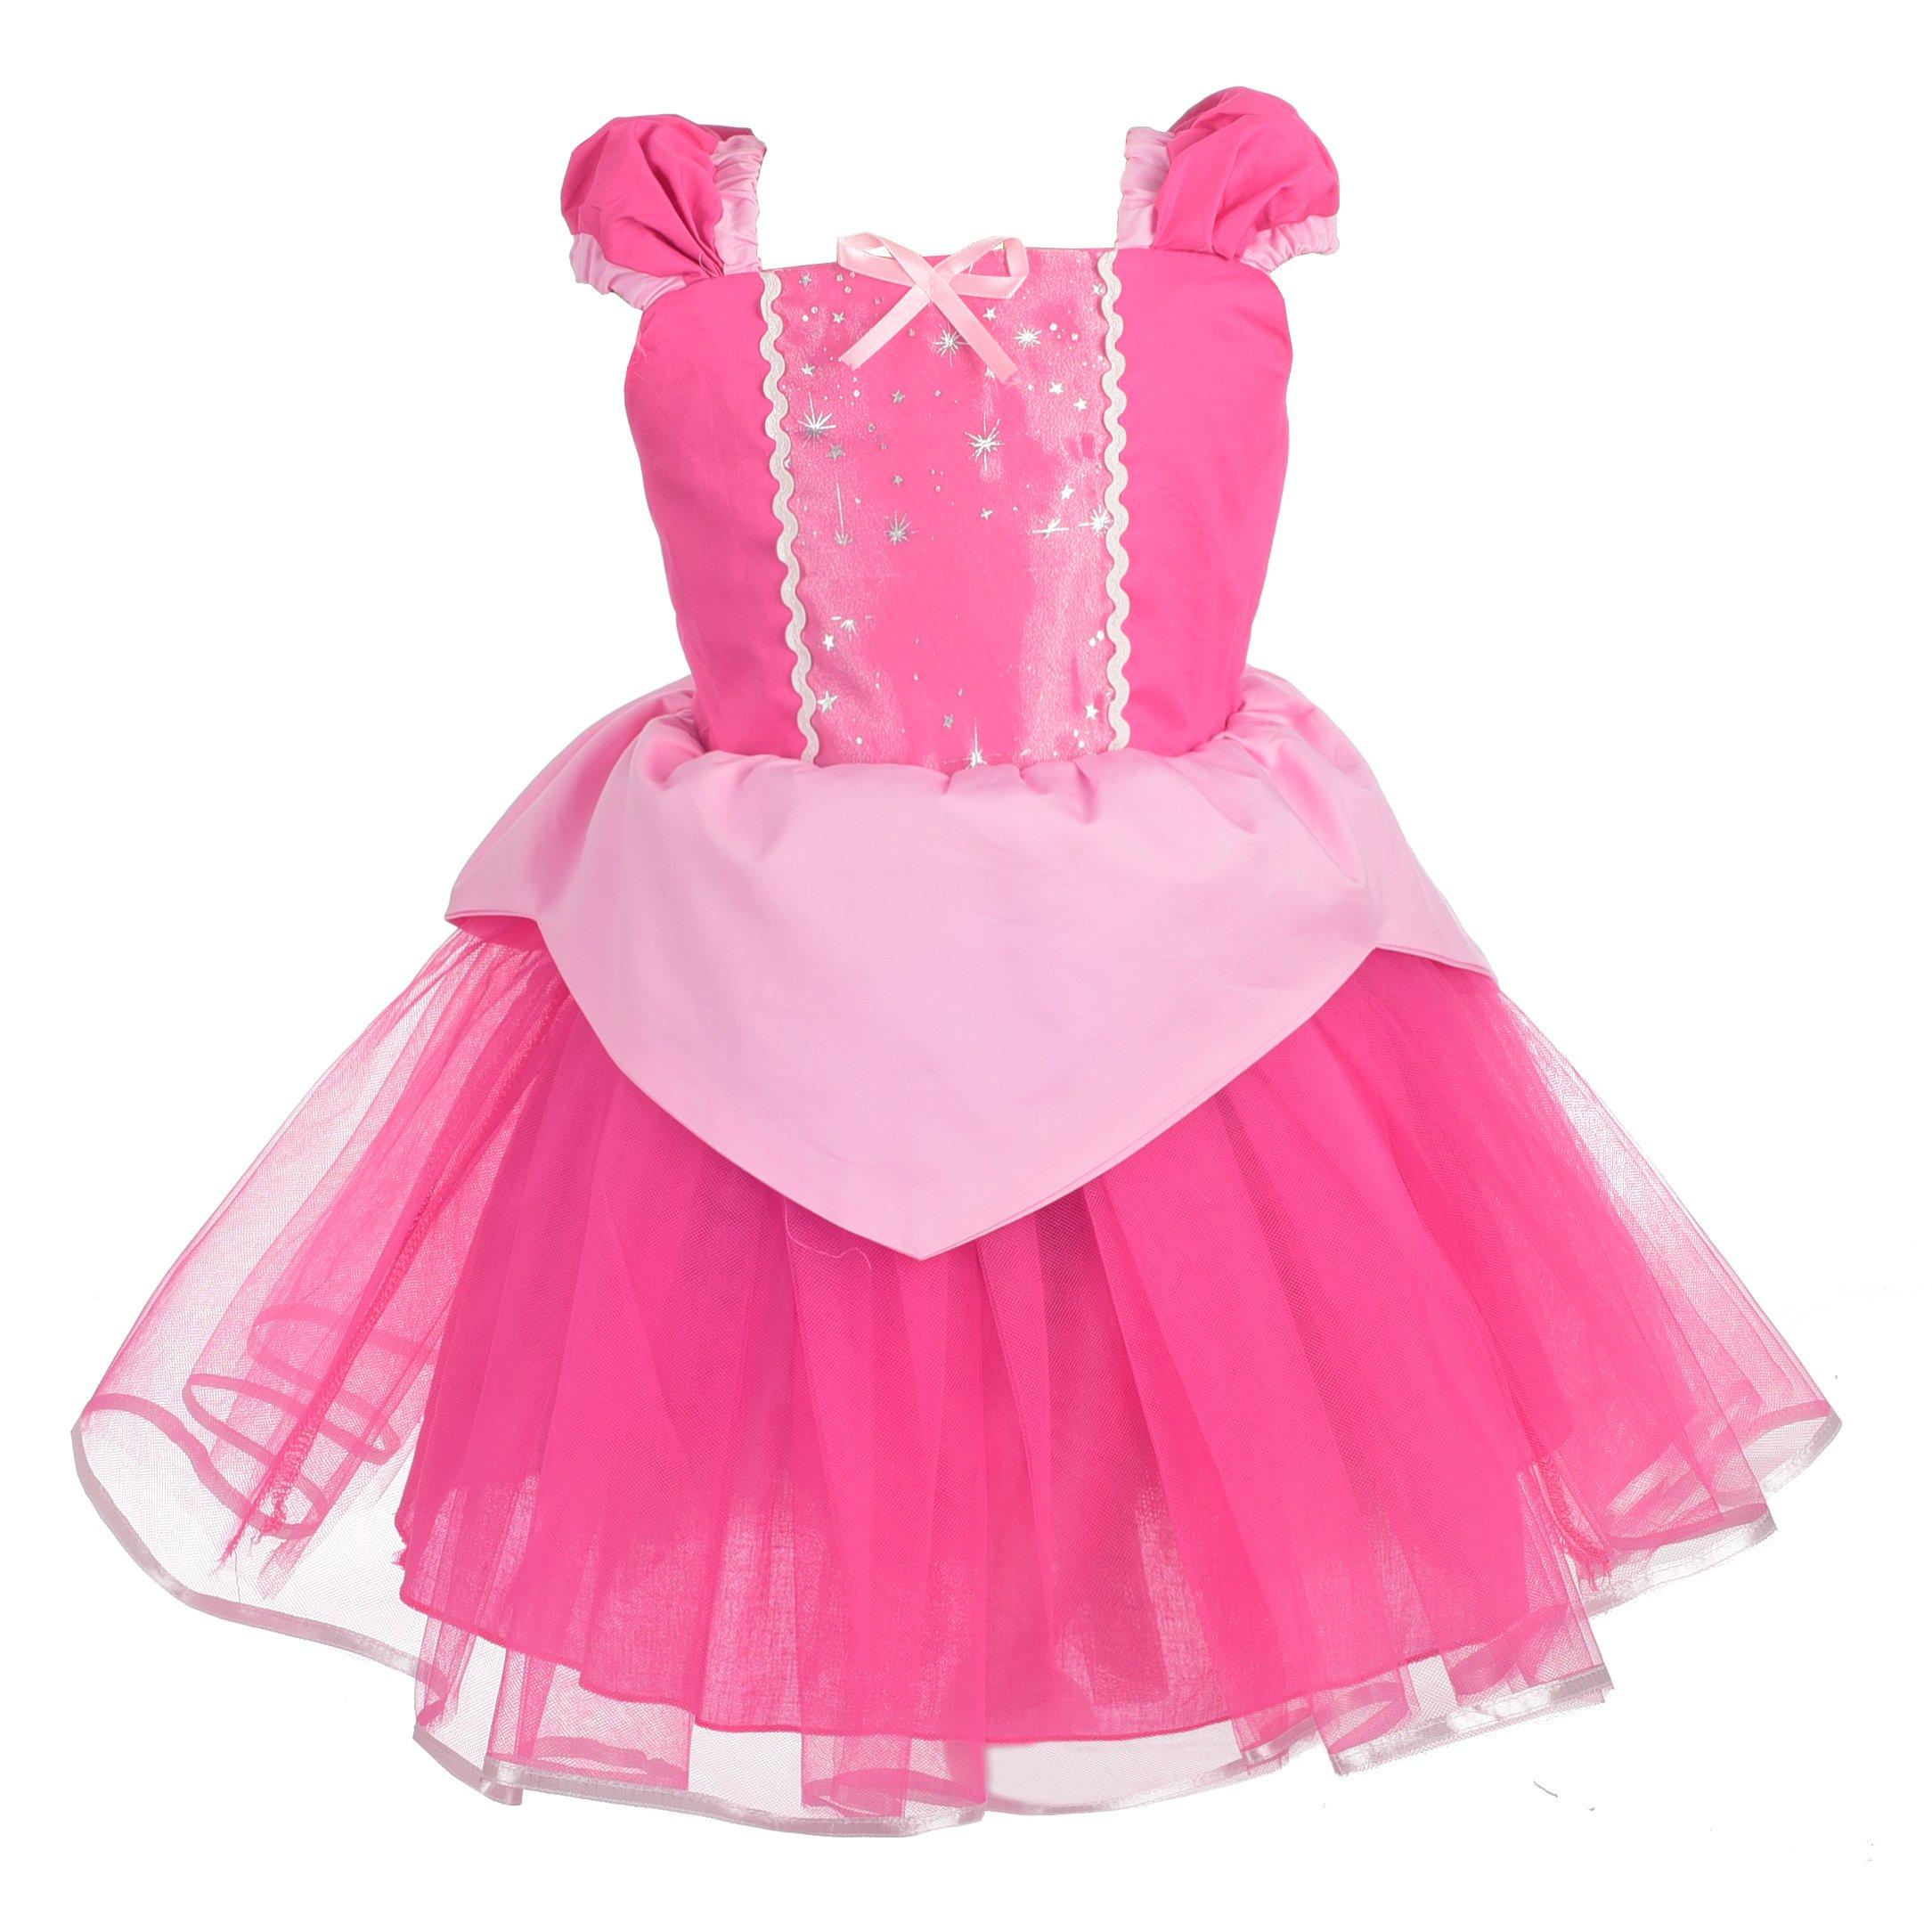 Dressy Daisy Baby Girls Princess Aurora Dress Costume Summer Dress up Size 18-24 Months